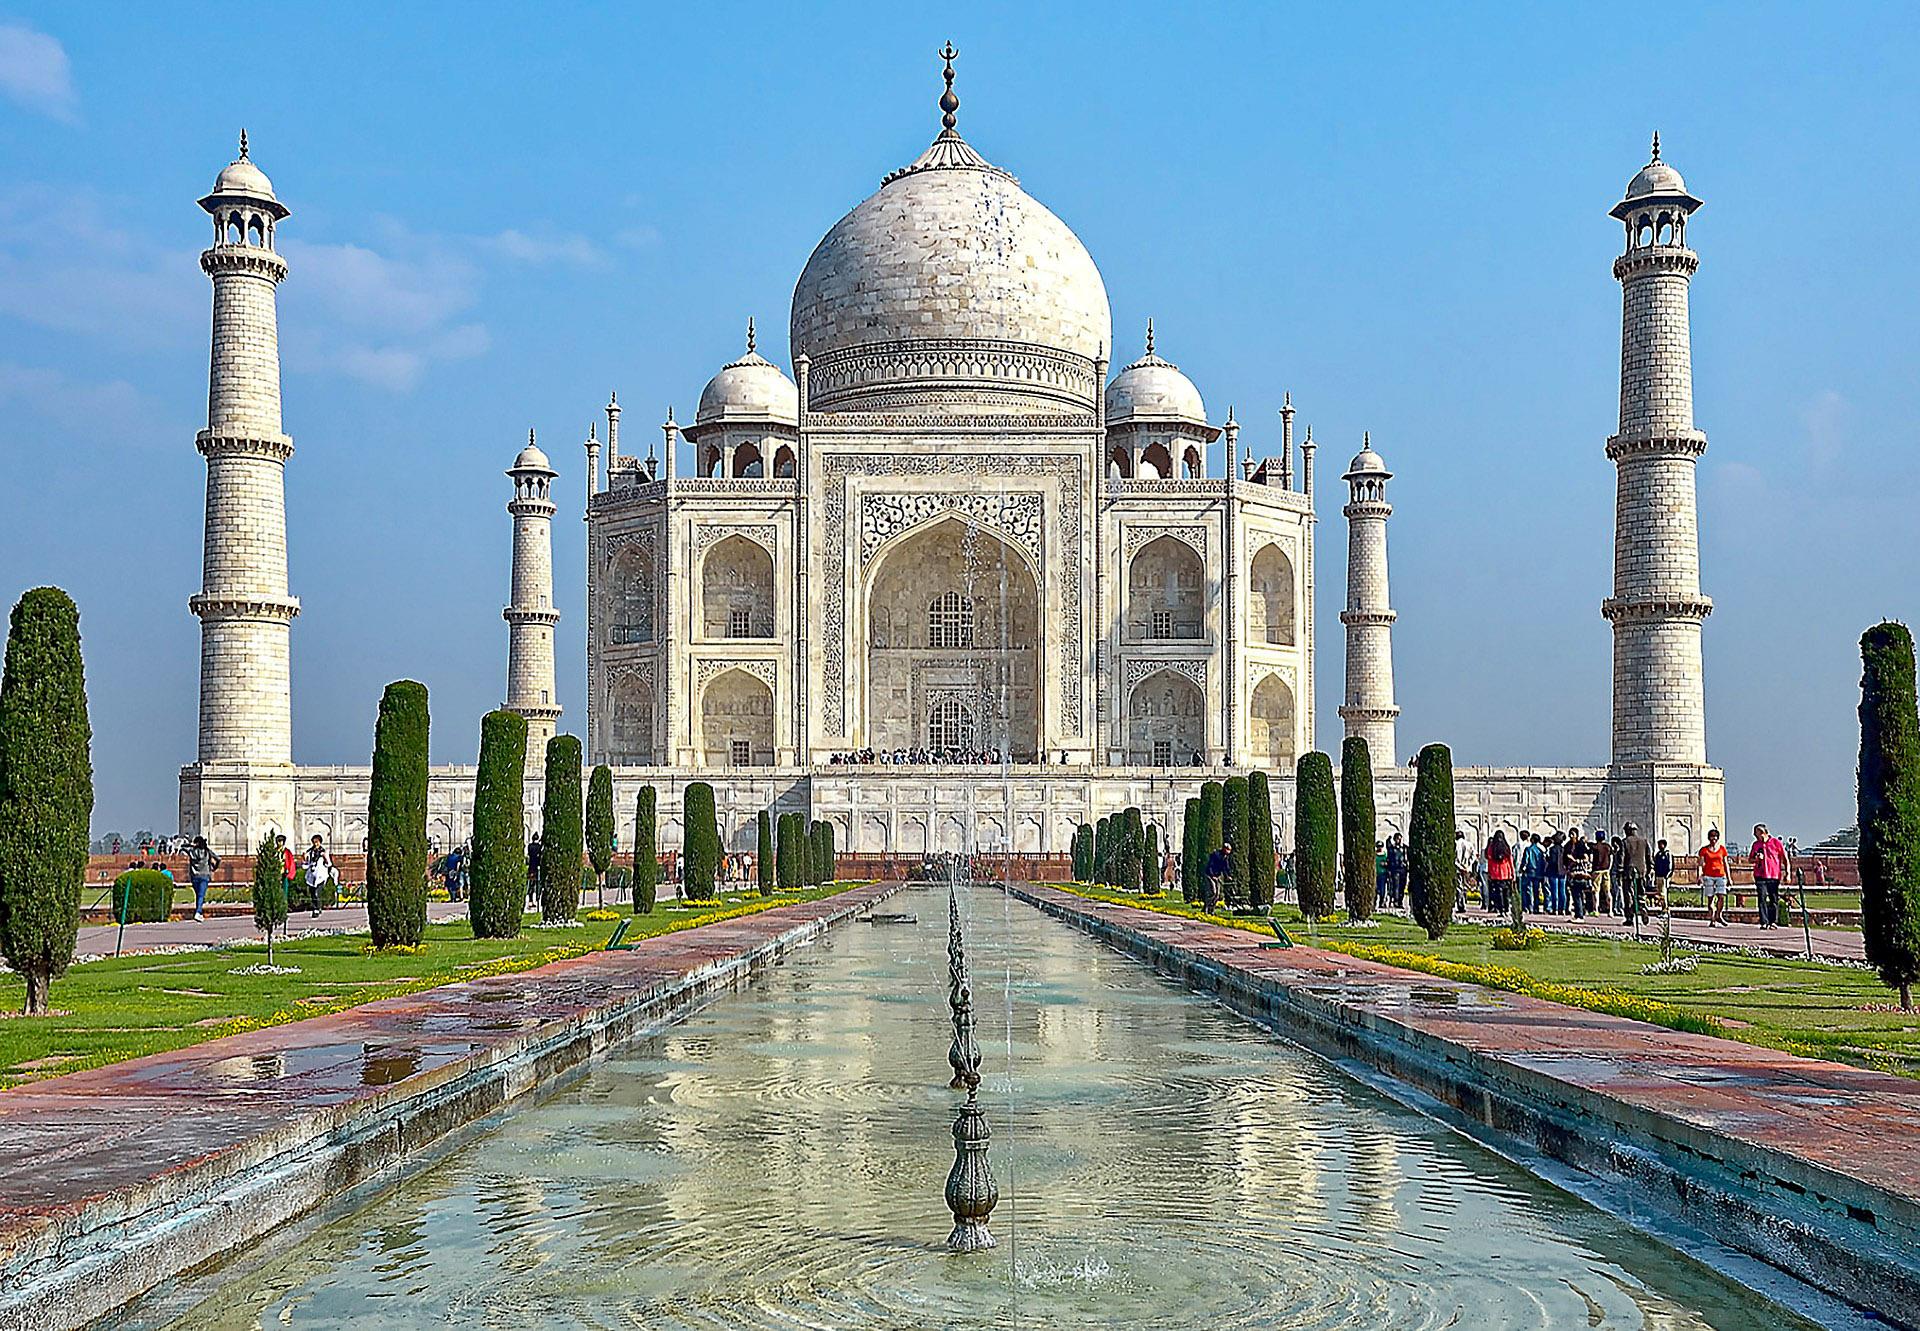 India - Taj Mahal in Agra